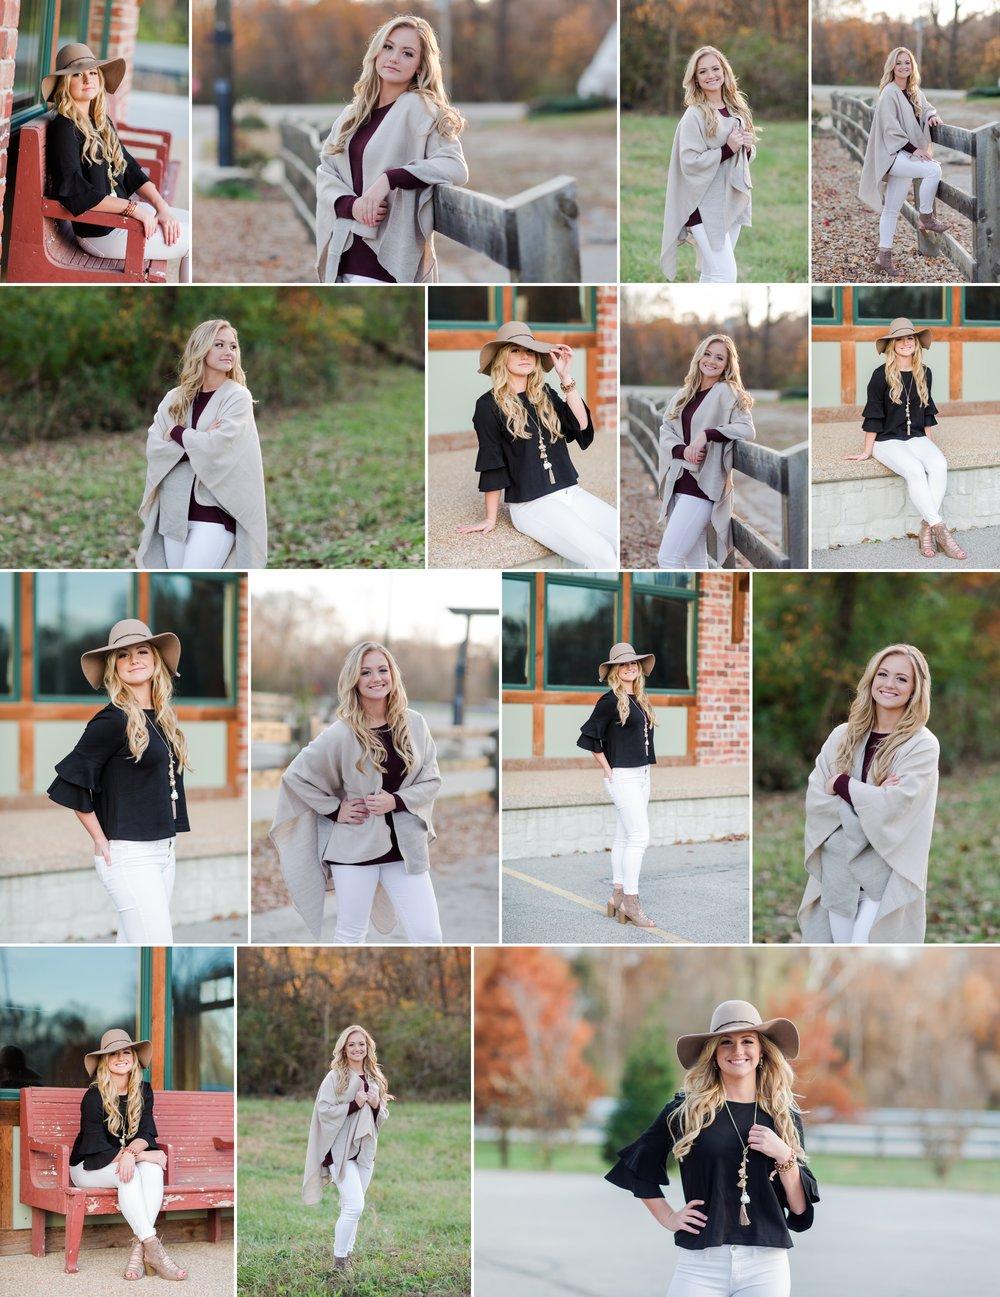 senior_girl_photography_labadie_missouri_mo_photographer_trendy_hat_props_ideas_posing_washington_mo_photographer 1